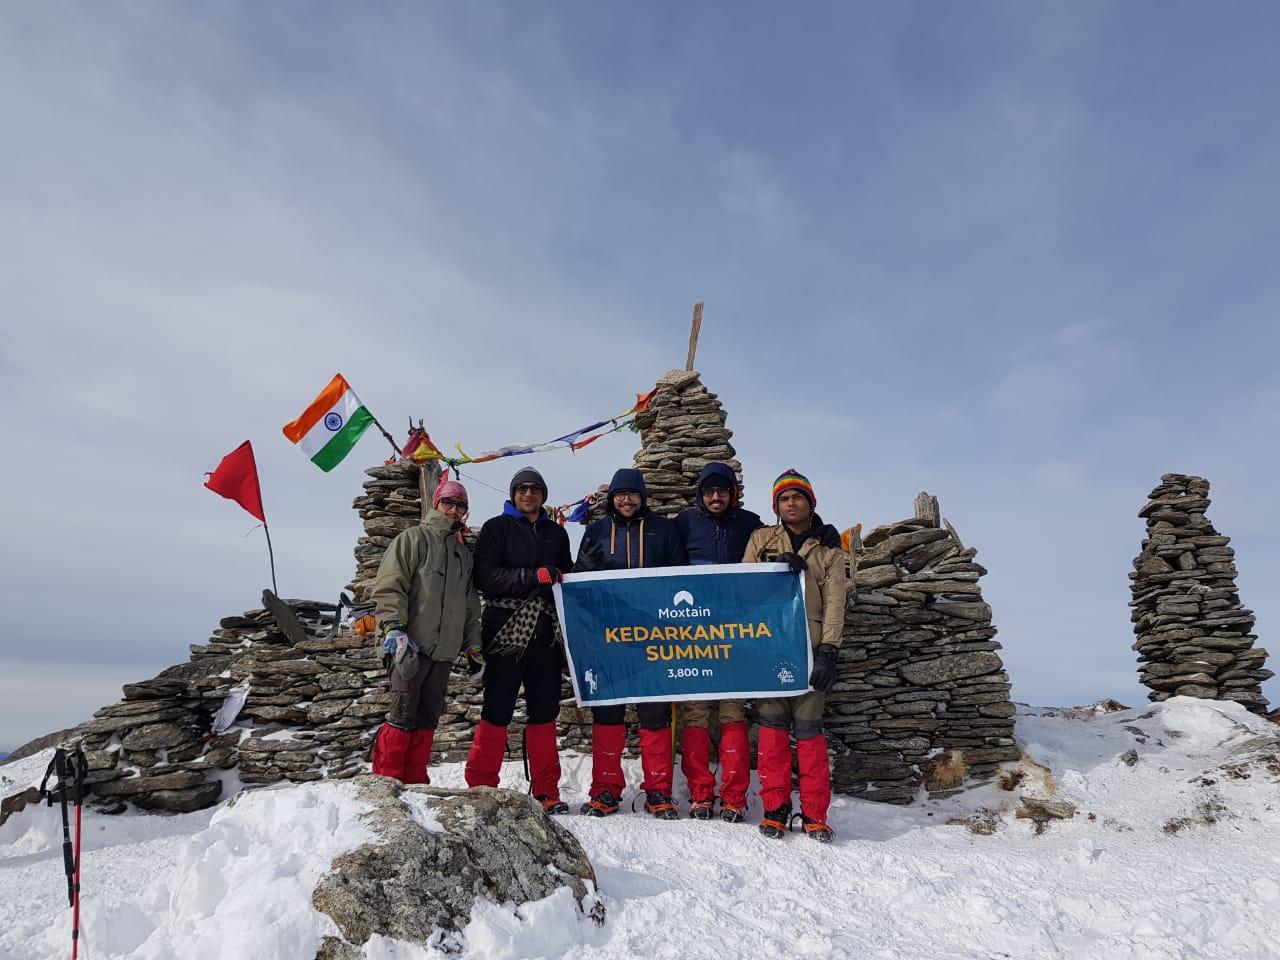 trekkers holding banner at kedarkantha summit